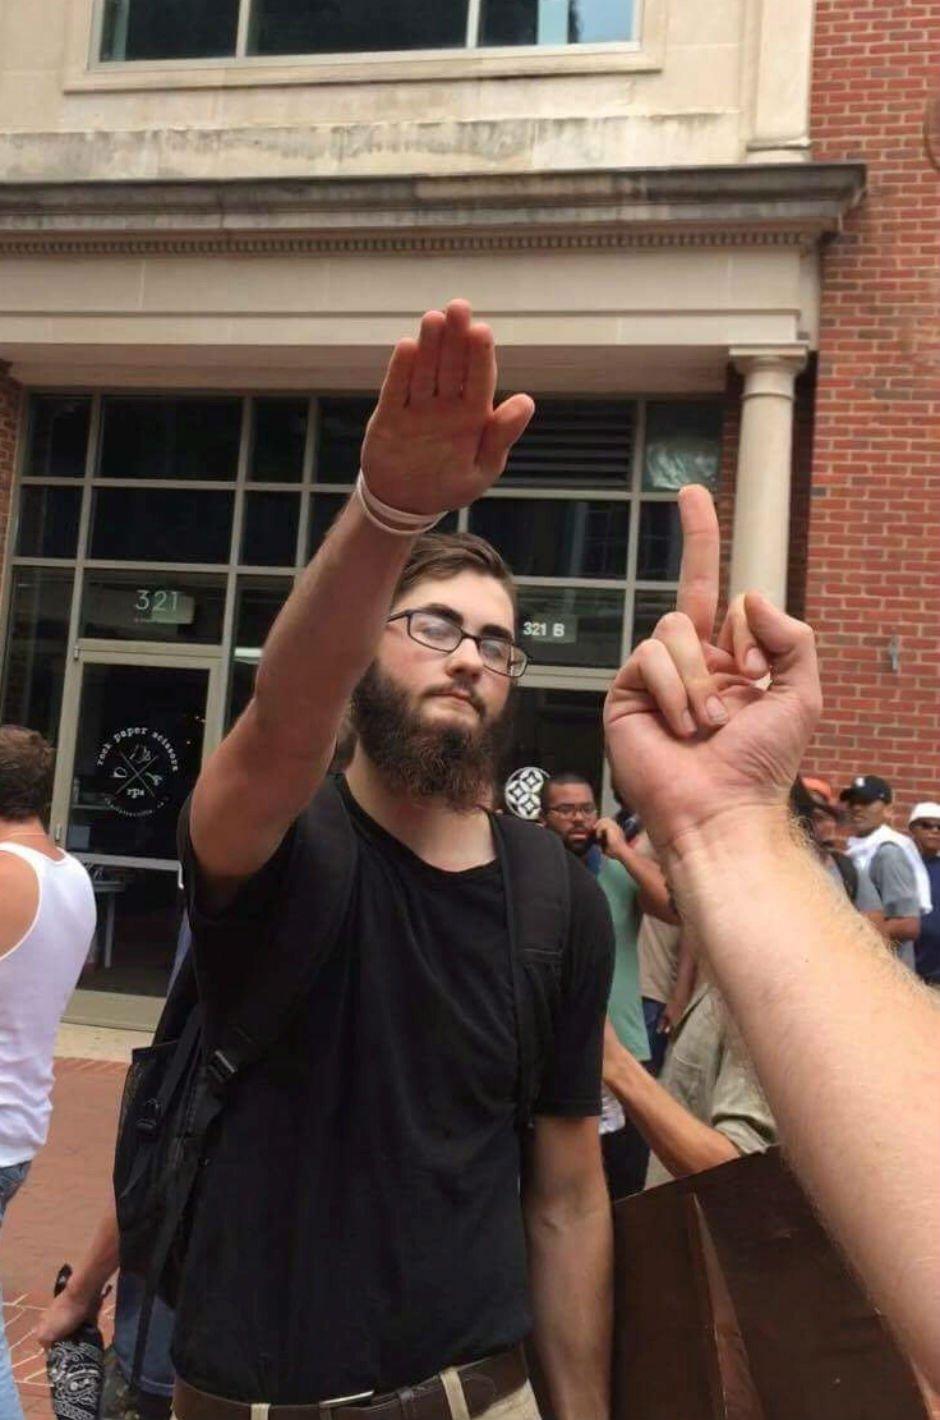 #PunchANazi #Charlottesville https://t.co/Pxgfh14iDY